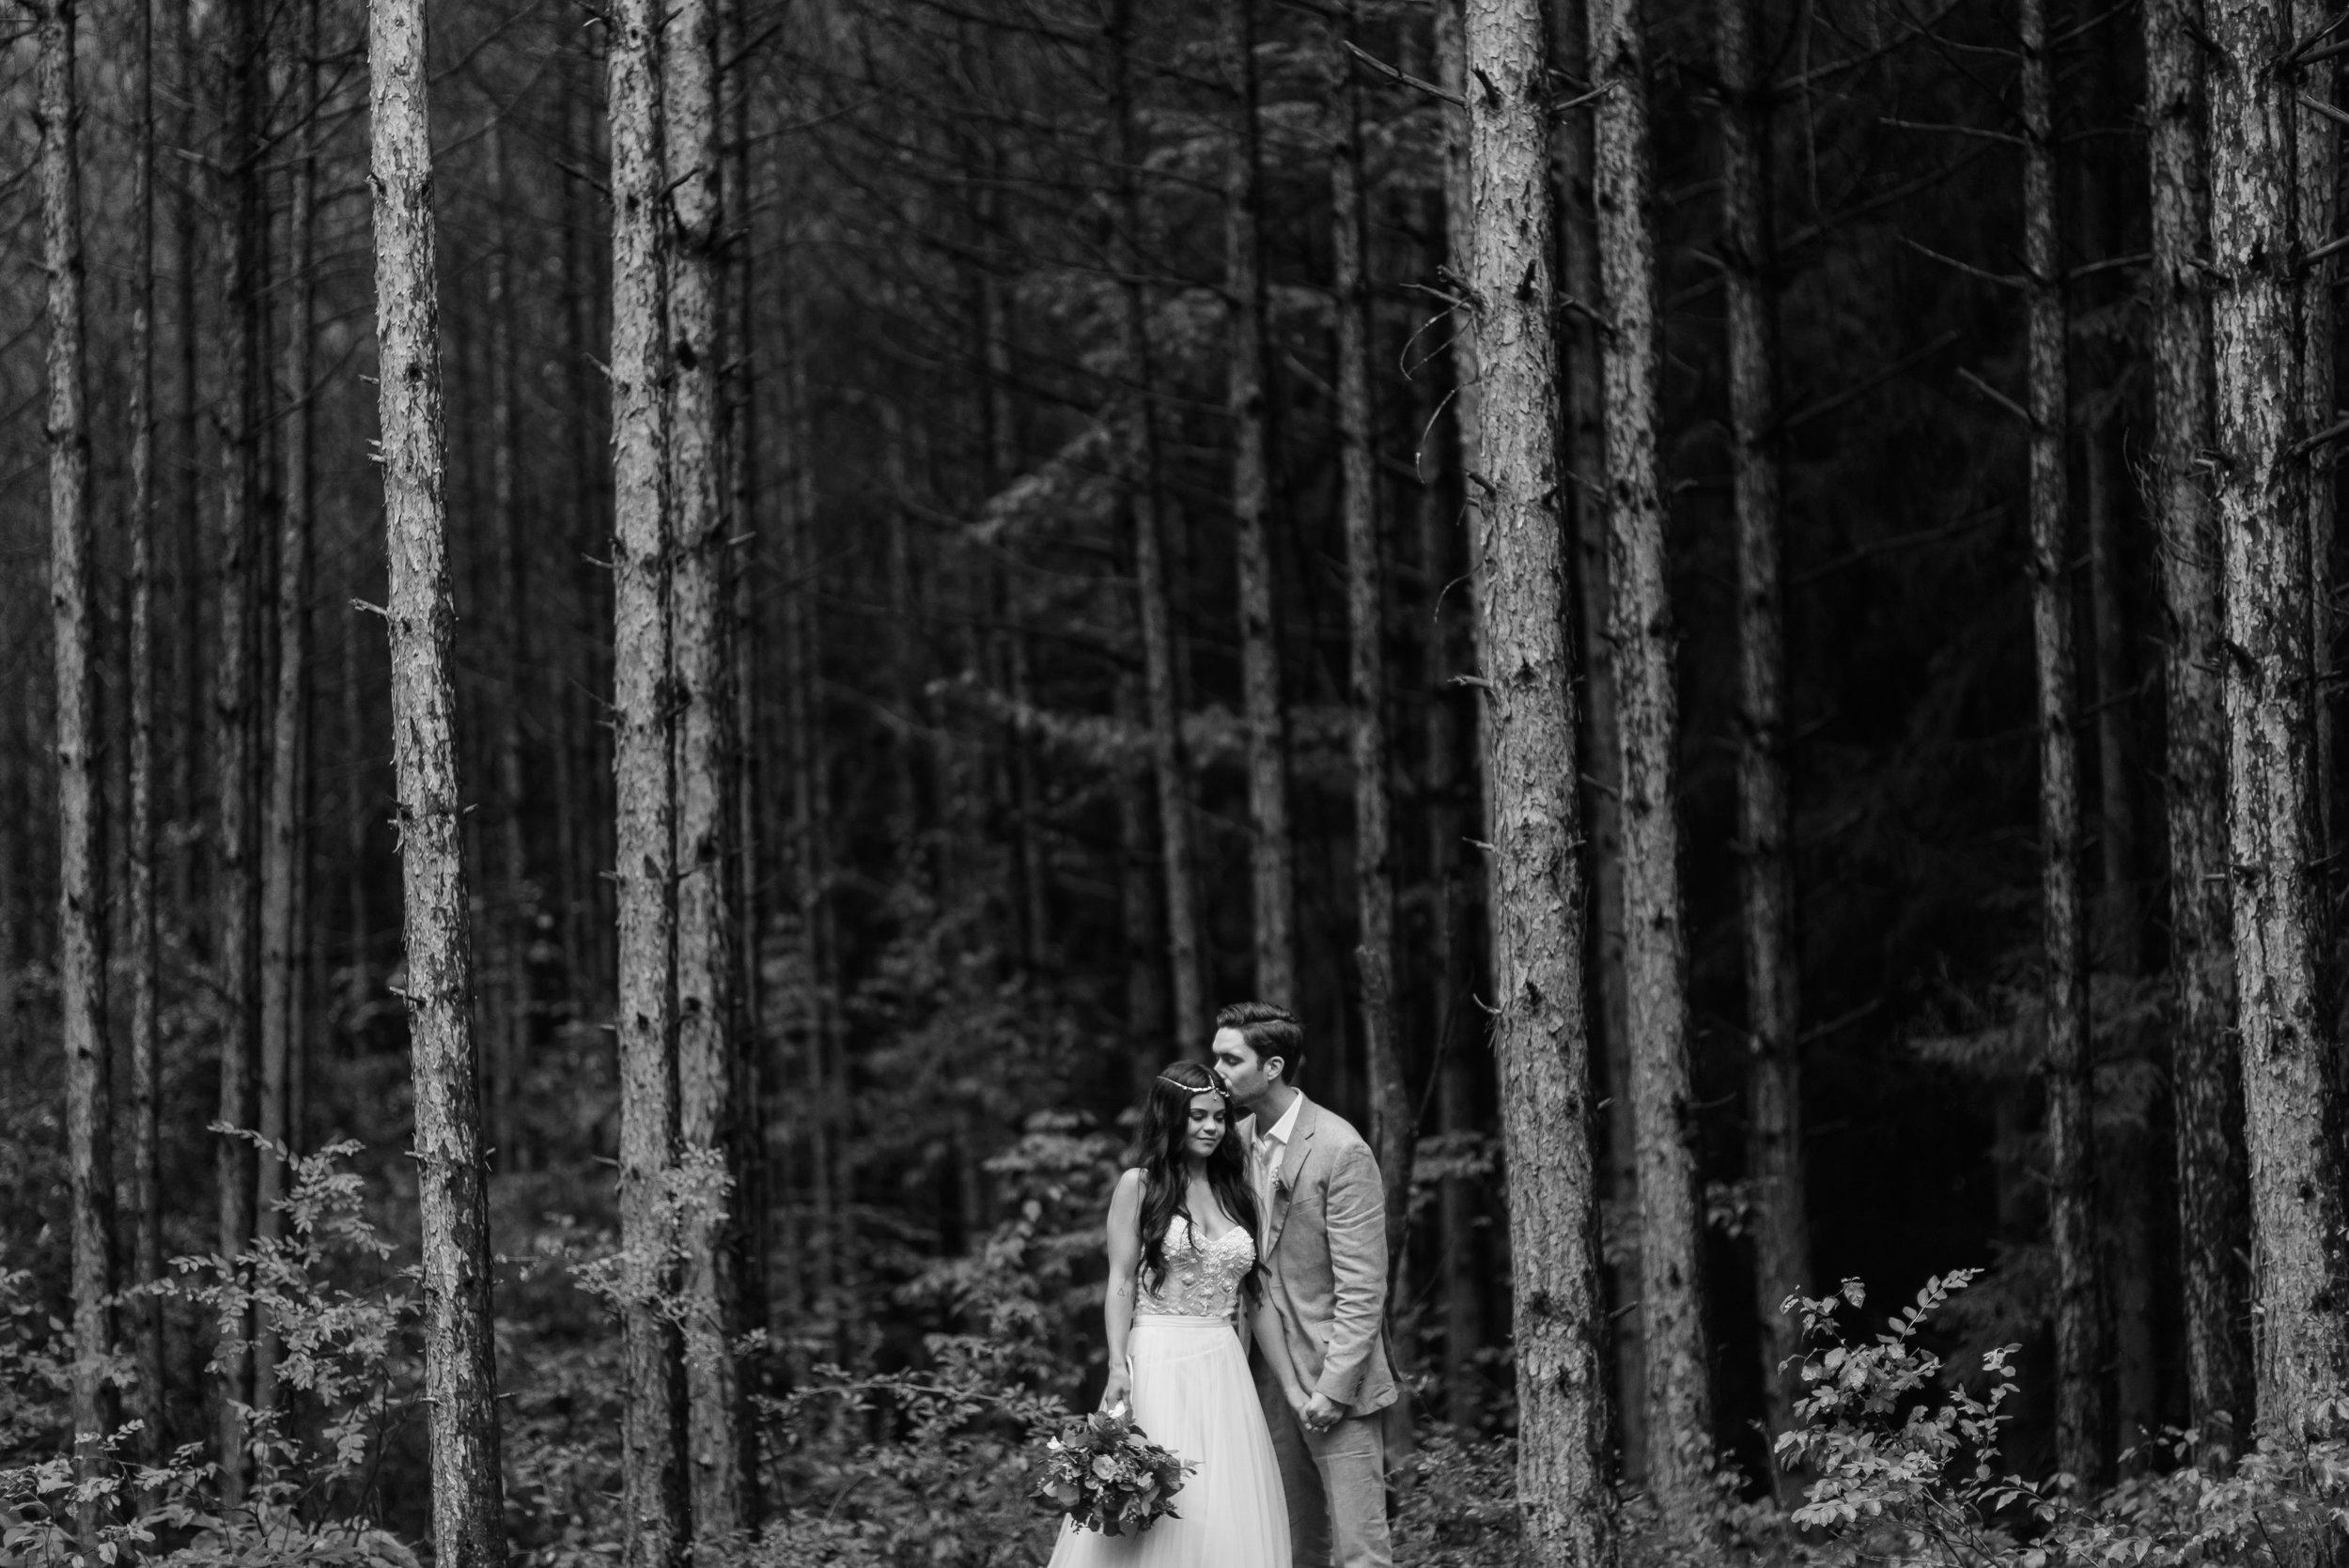 pittsburgh-wedding-photographer-horizonviewfarms-barn-farm-boho-vegan-chic0324.jpg